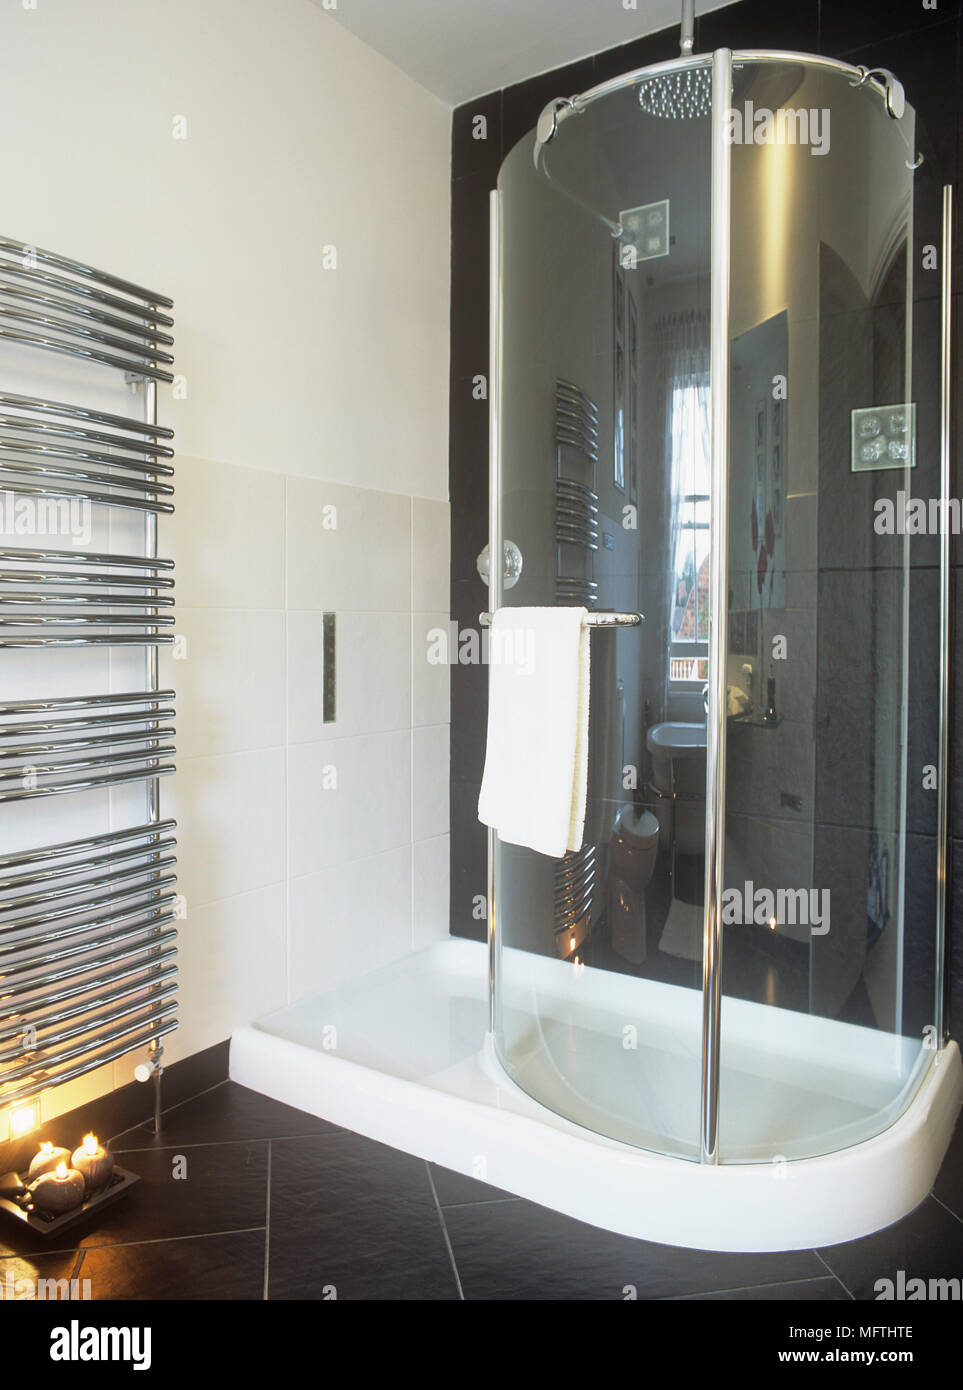 Heated Towel Rail Stock Photos & Heated Towel Rail Stock Images - Alamy